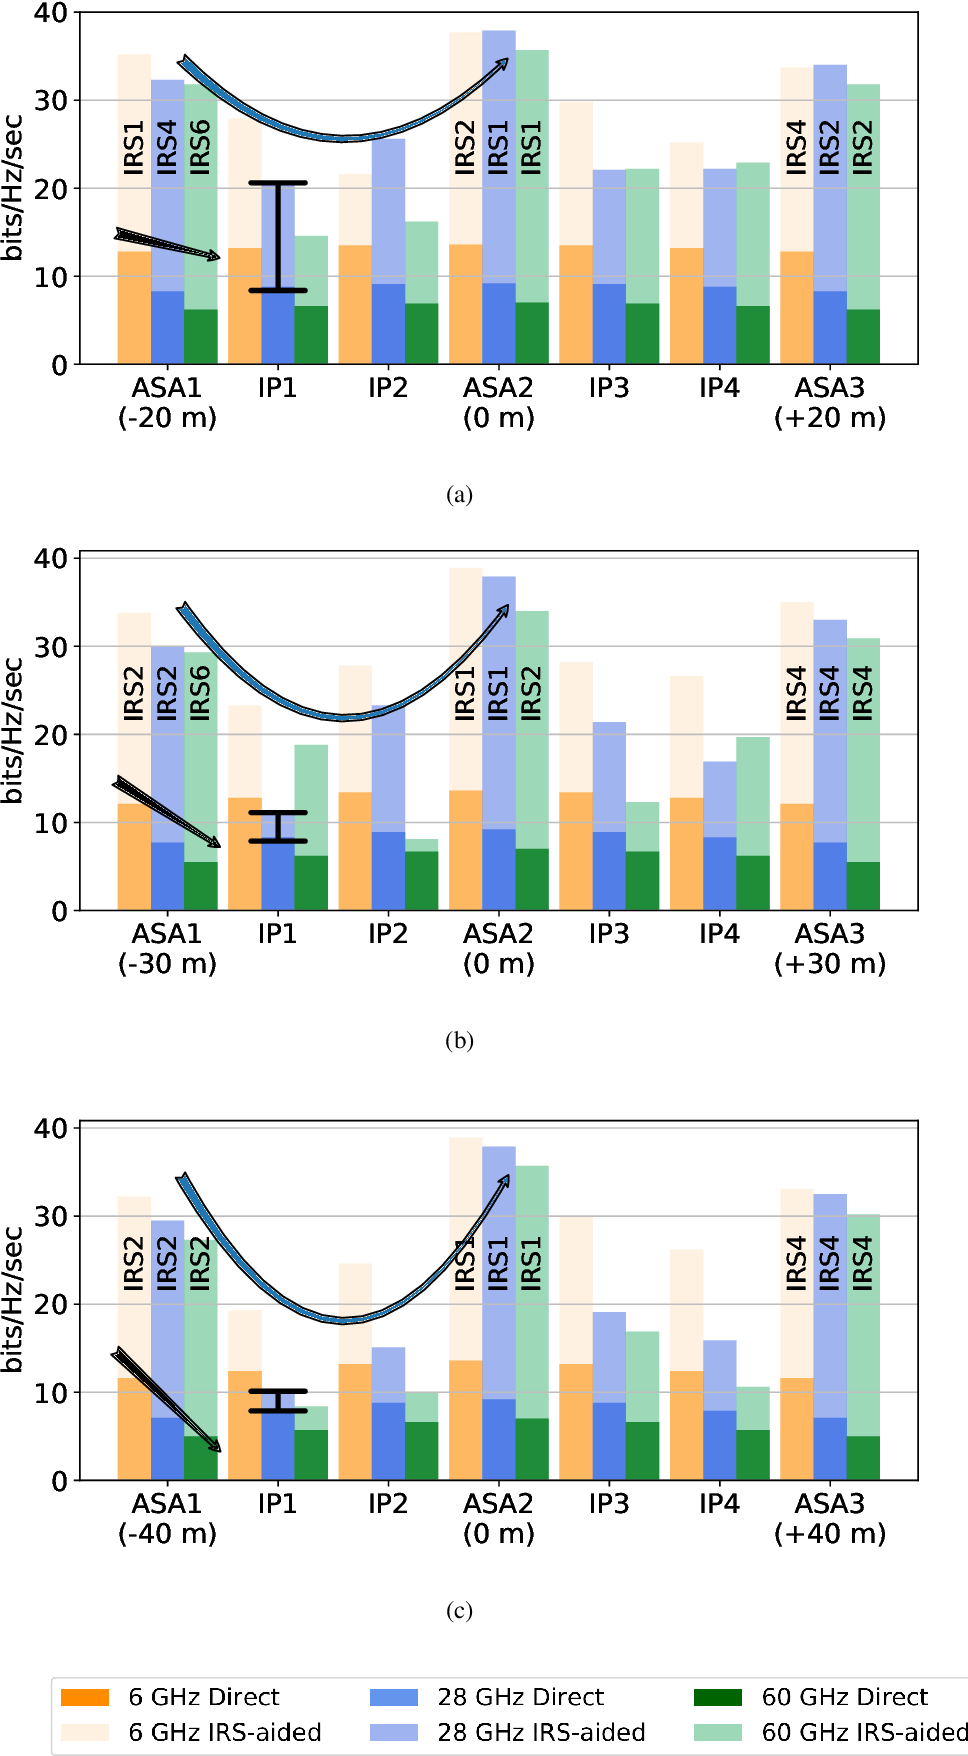 Figure 4 for Channel Rank Improvement in Urban Drone Corridors Using Passive Intelligent Reflectors